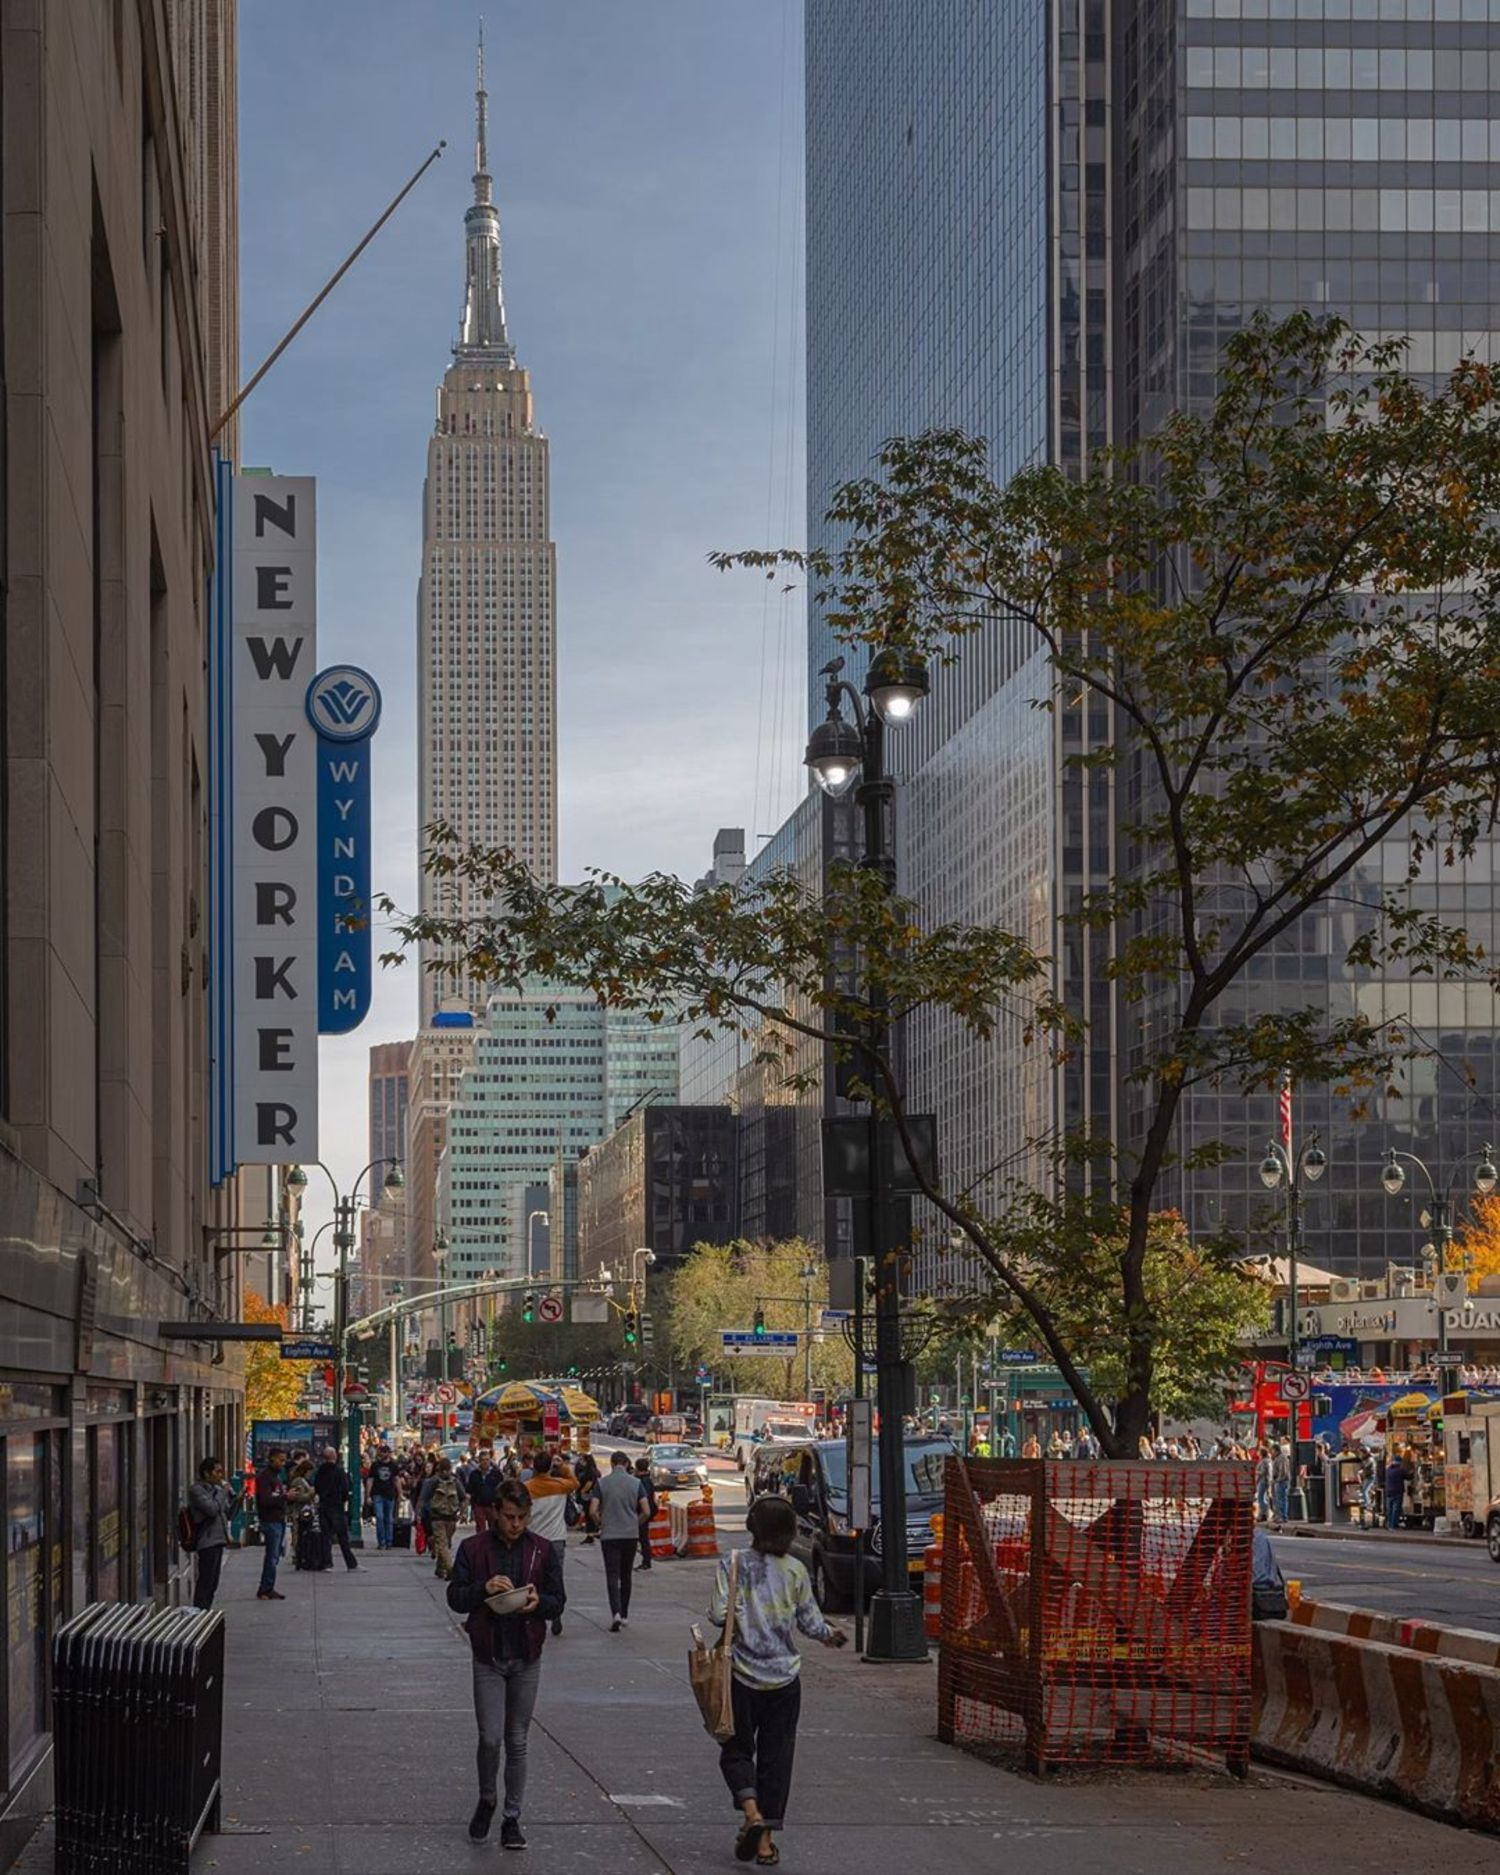 34th Street, Midtown, Manhattan